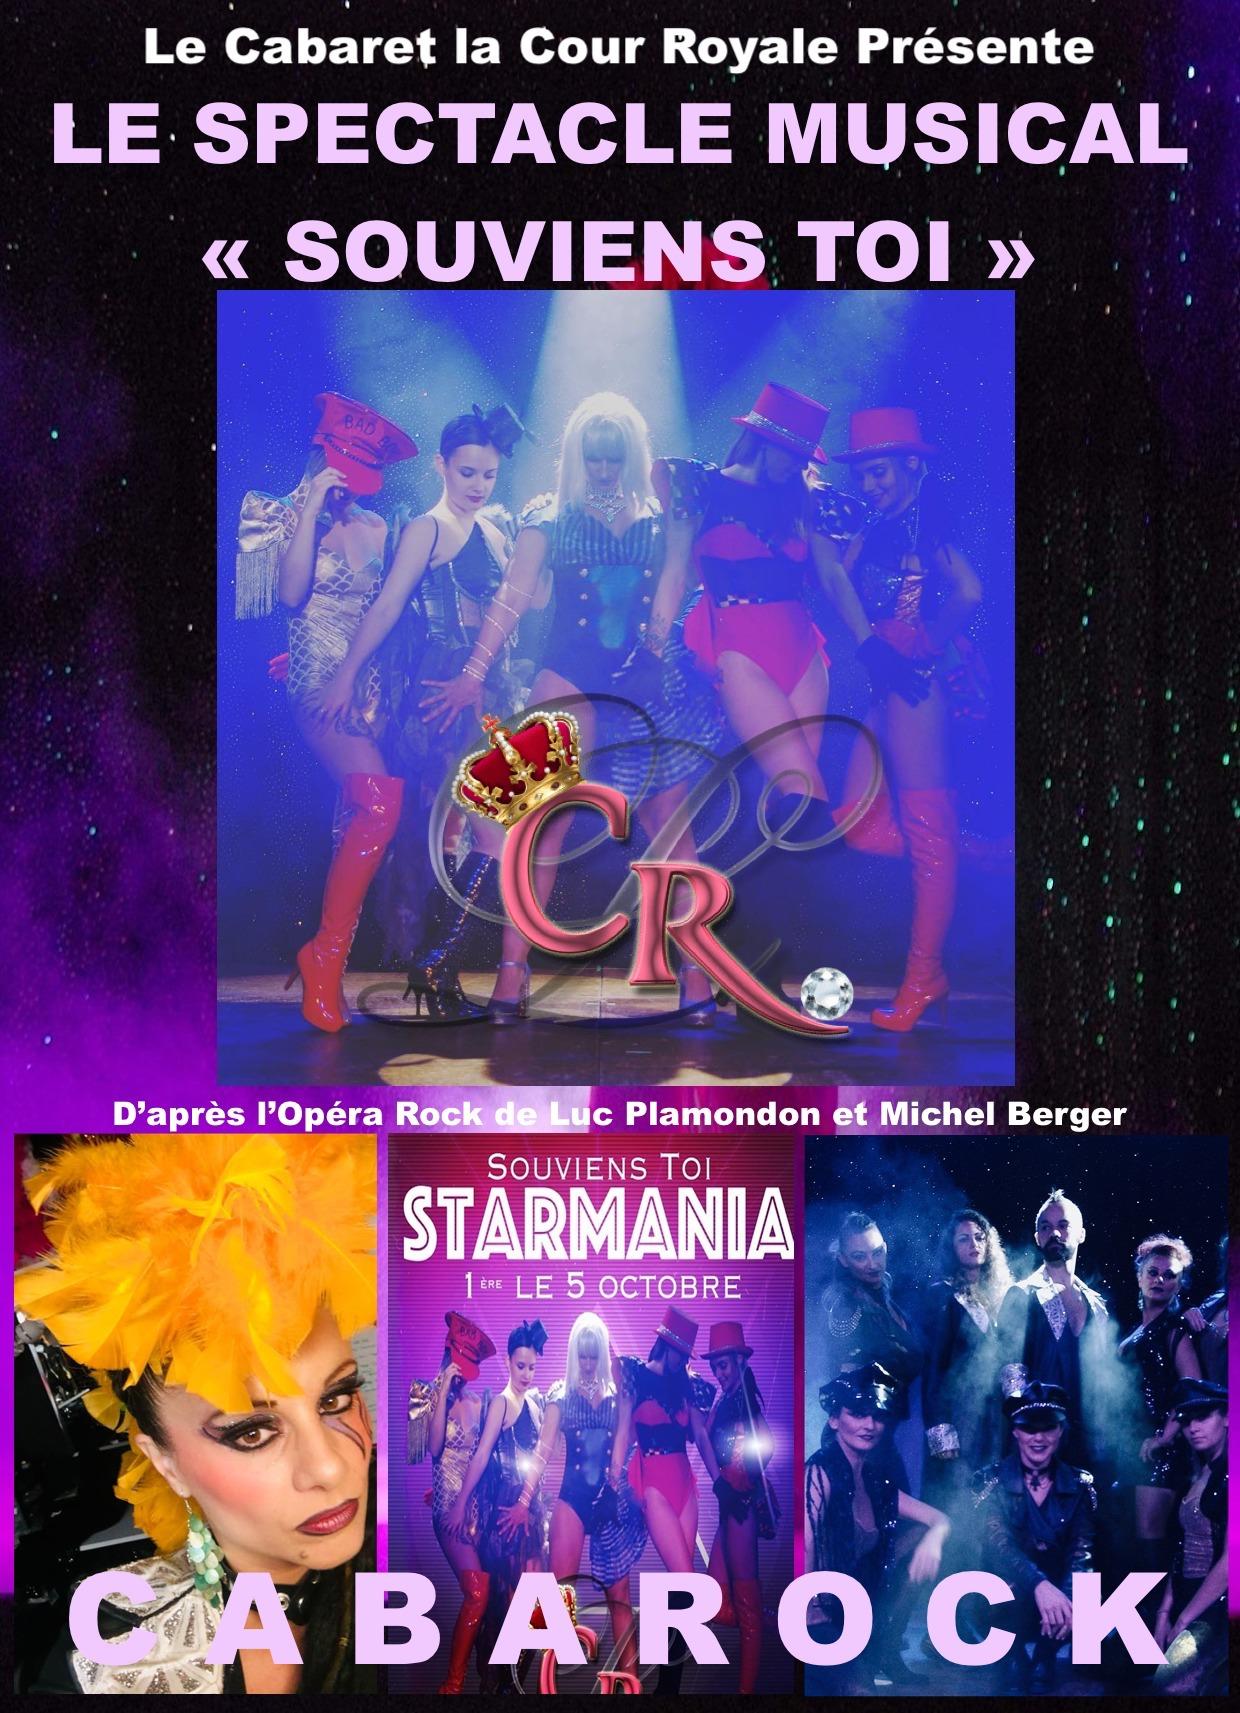 Dîner spectacle VAR Revue Starmania au cabaret la cour royale var, Dîners Spectacles